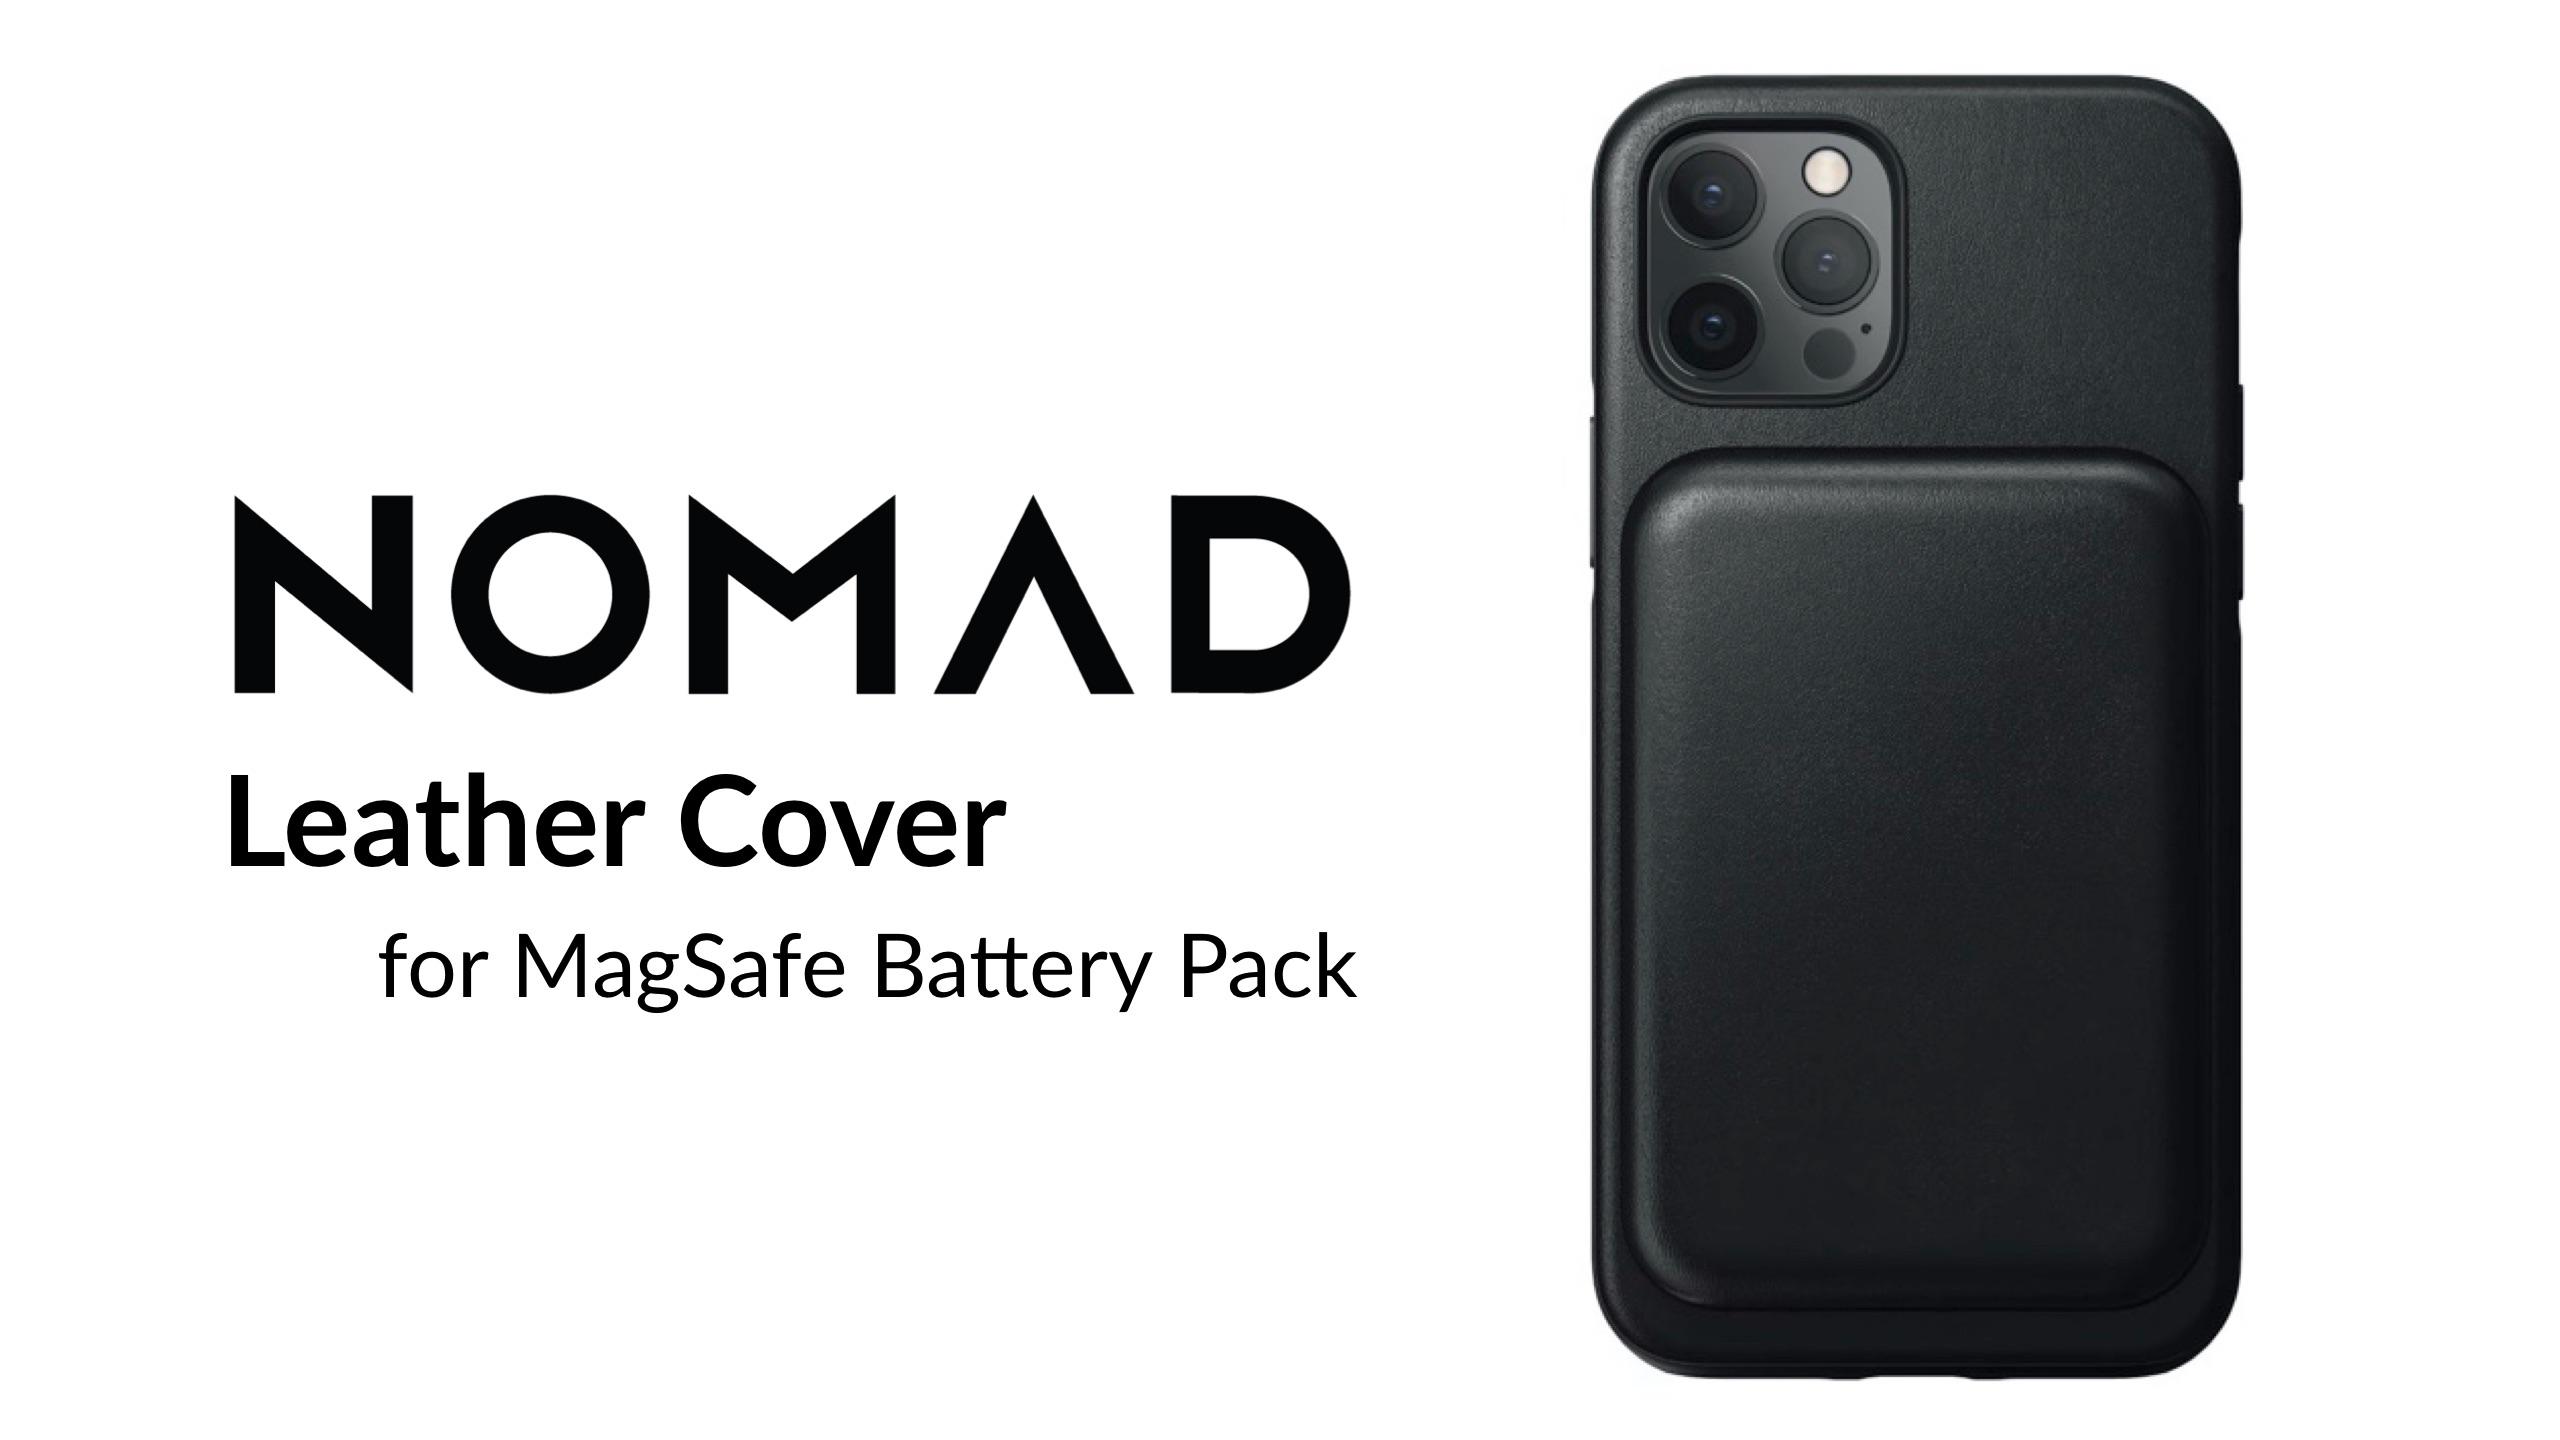 NOMADのMagSafeバッテリーパック専用ケース発売!これは欲しくなるやつ